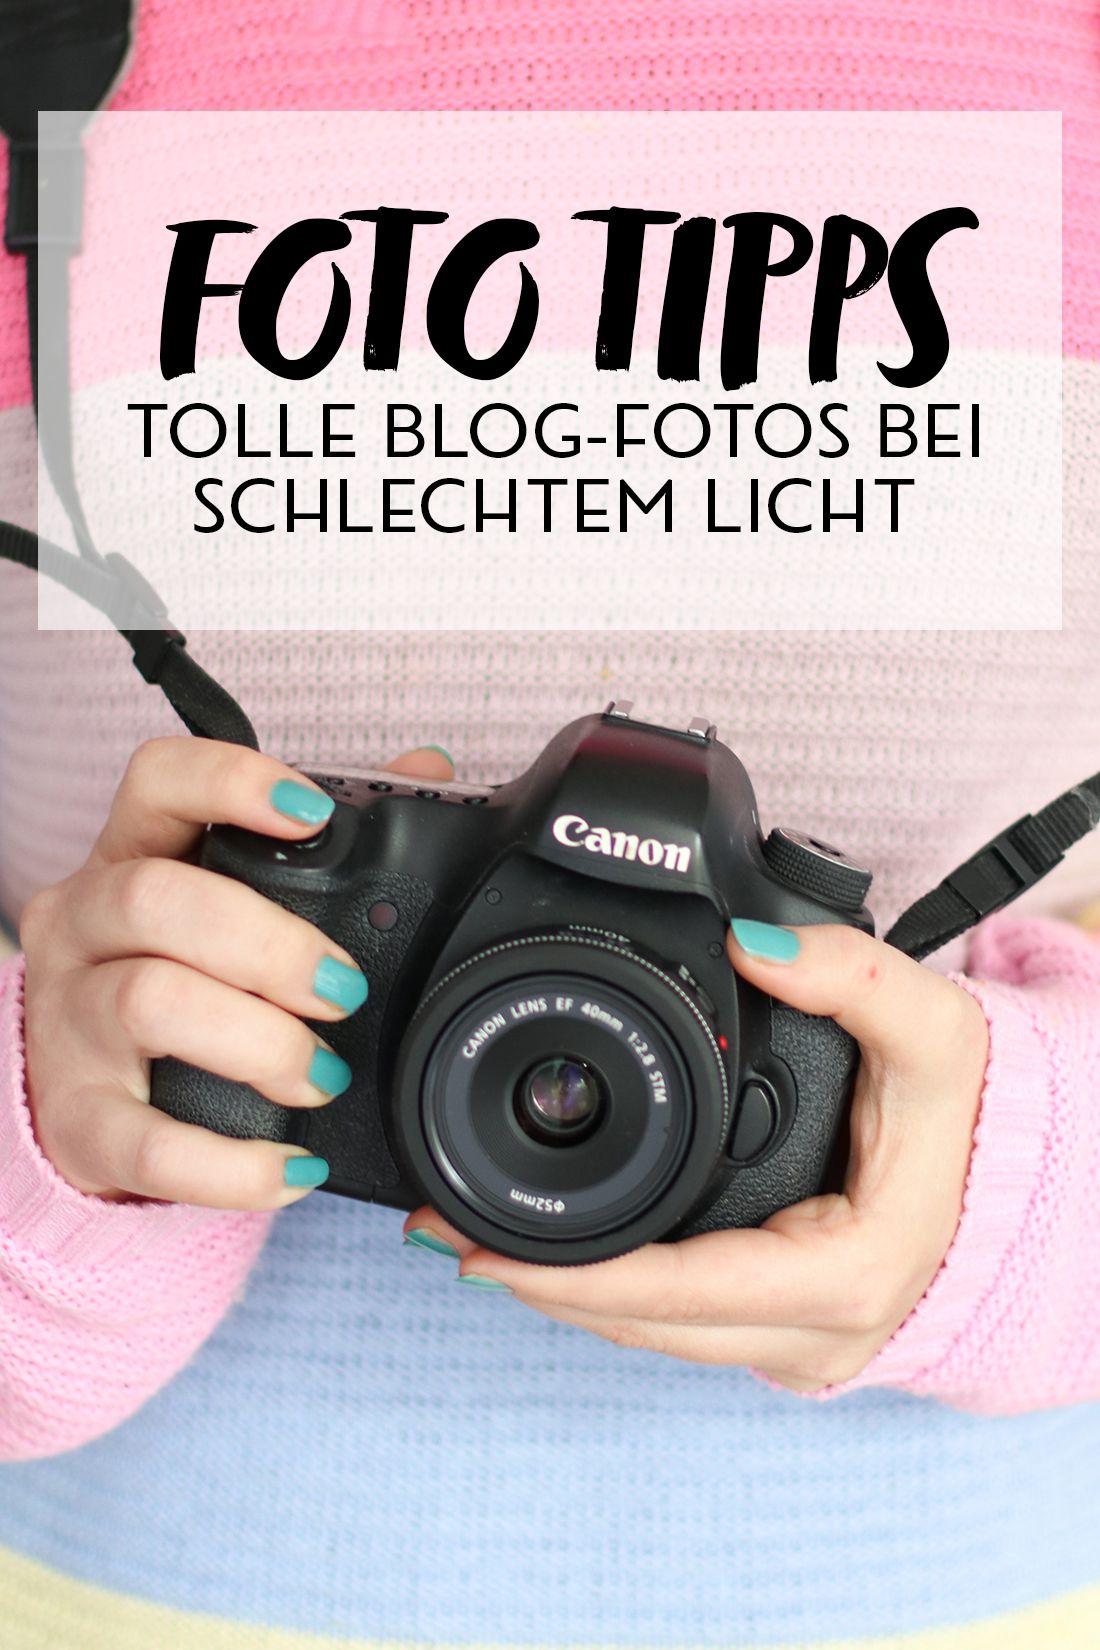 Tipps Beim Fotografieren 9 tipps zum fotografieren bei schlechtem licht gute fotos